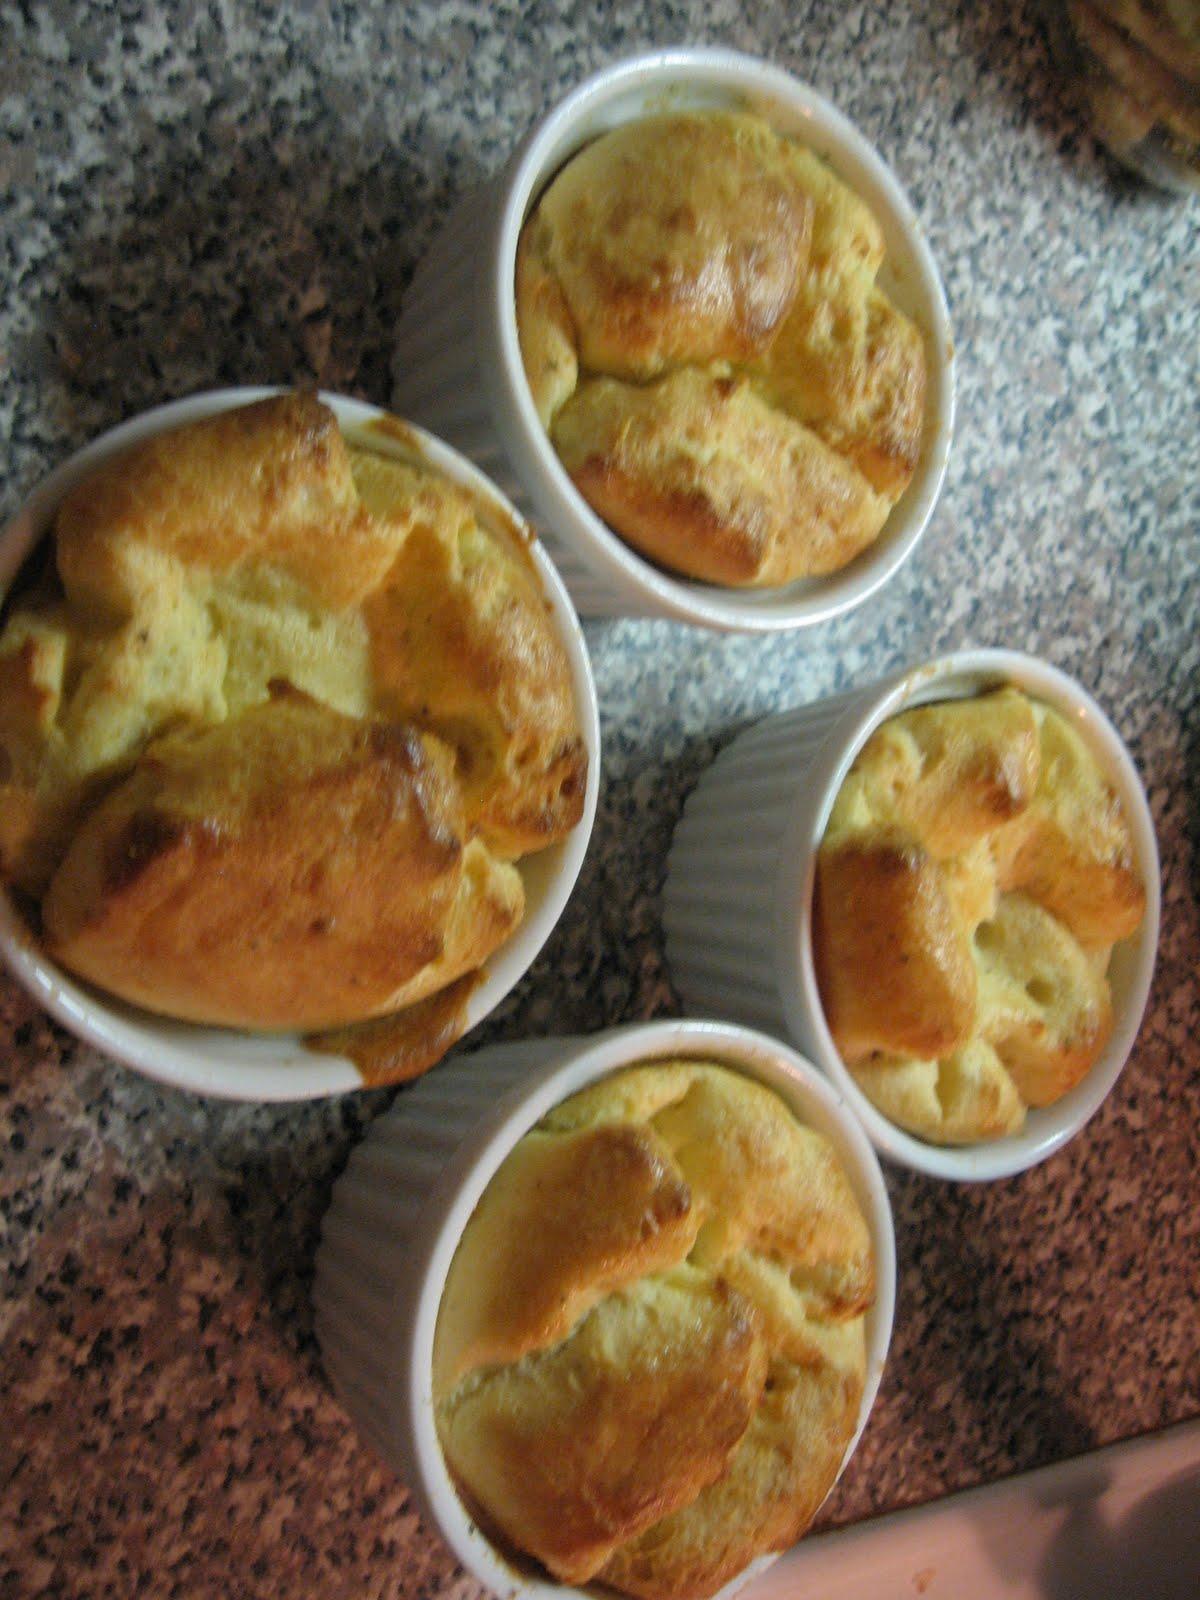 Palates & Palettes: Goat cheese souffle